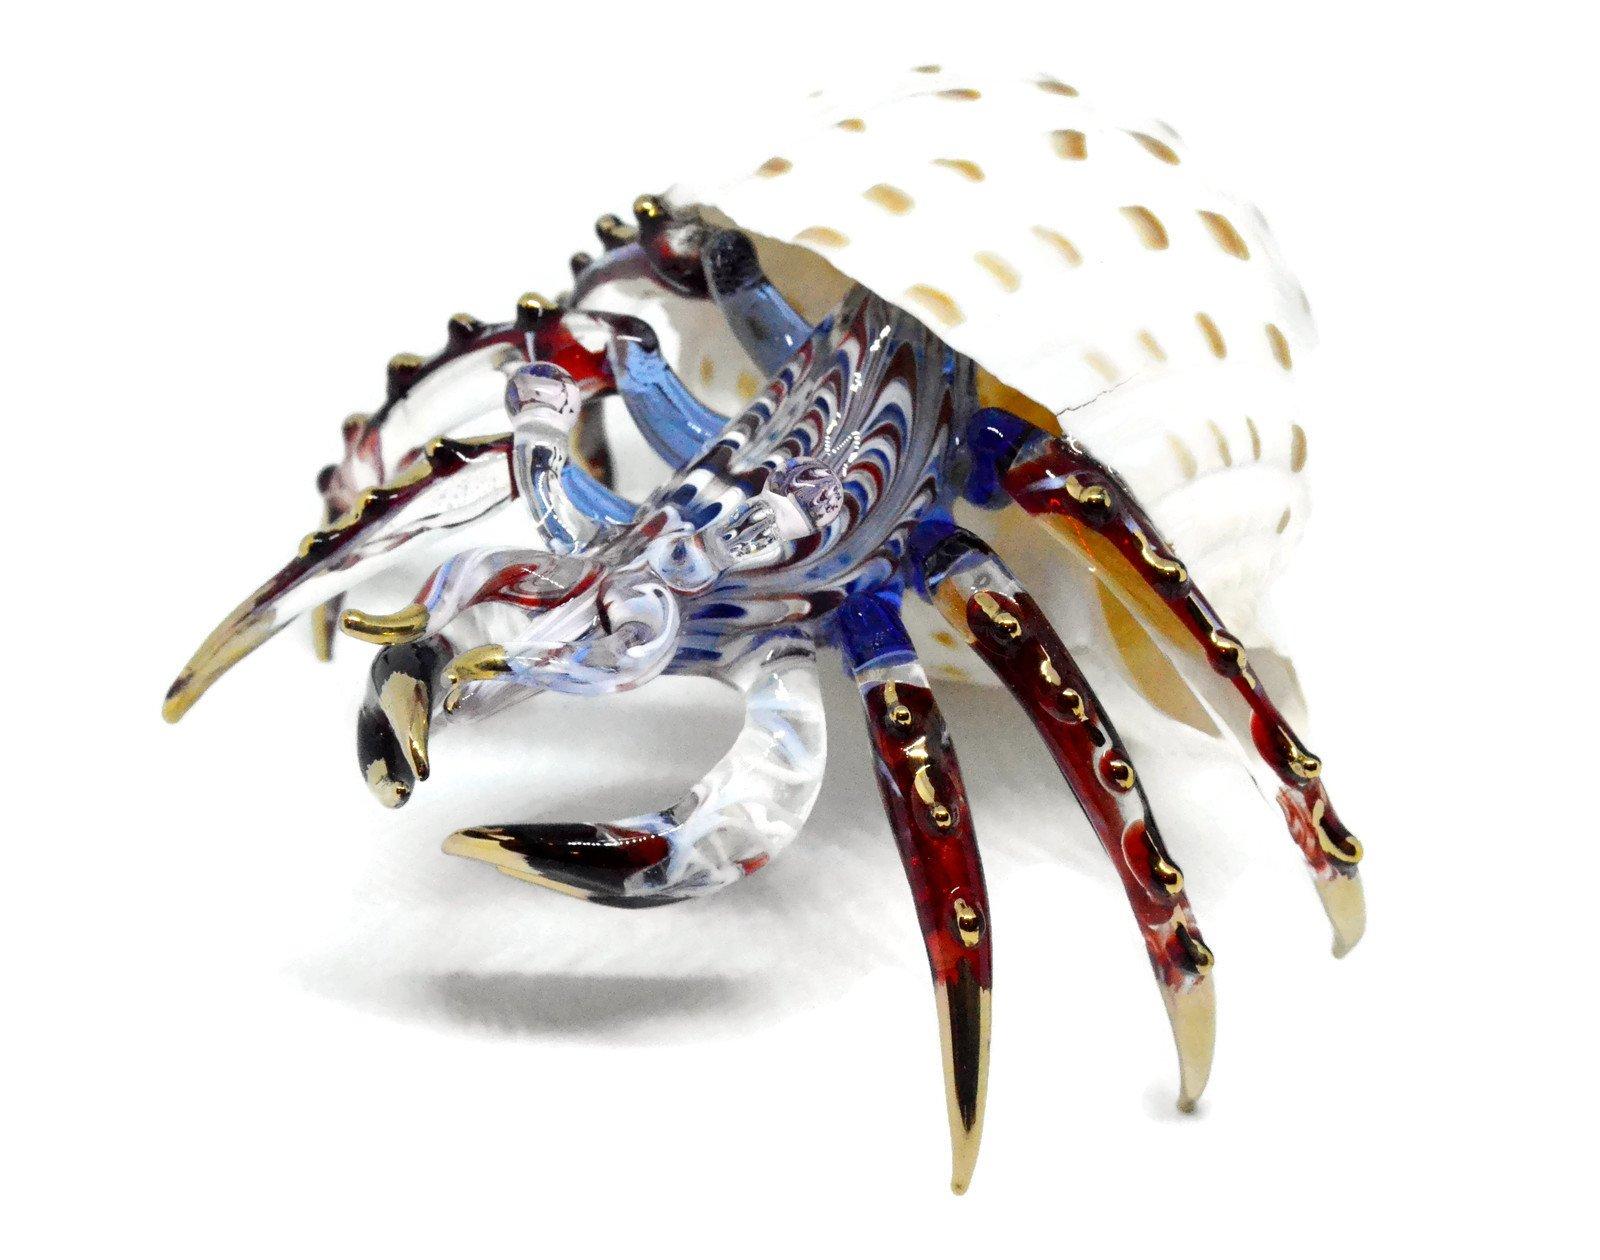 NaCraftTH Glass Figure Hermit Crab in Seashell Murano Glass Blow Artwork Handicraft Crystal Ocean Sea Animal Figurine Fish Tank Aquarium Decorations